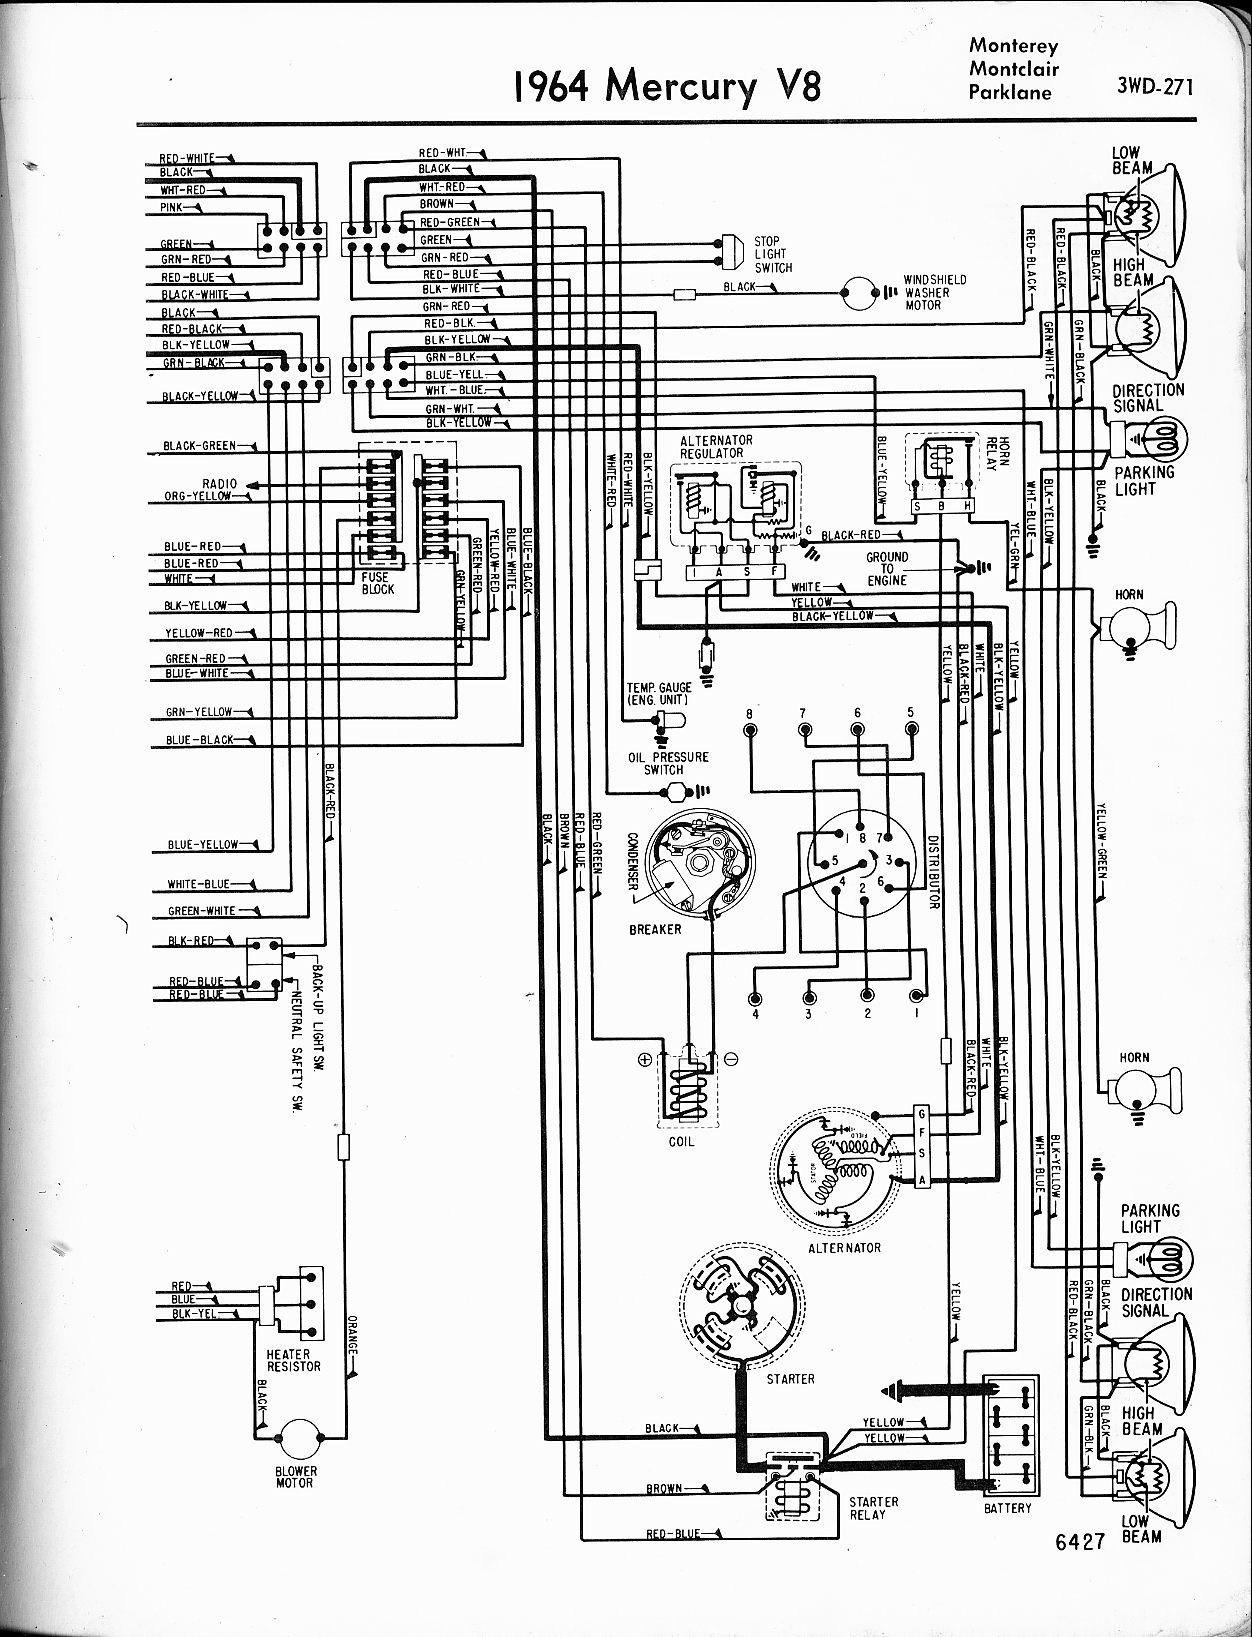 Indmar Wiring Harness Diagram - Www.cryptopotato.co • on yamaha gauges, yamaha oil cooler, yamaha control box, yamaha water pump, yamaha remote control, yamaha generator,